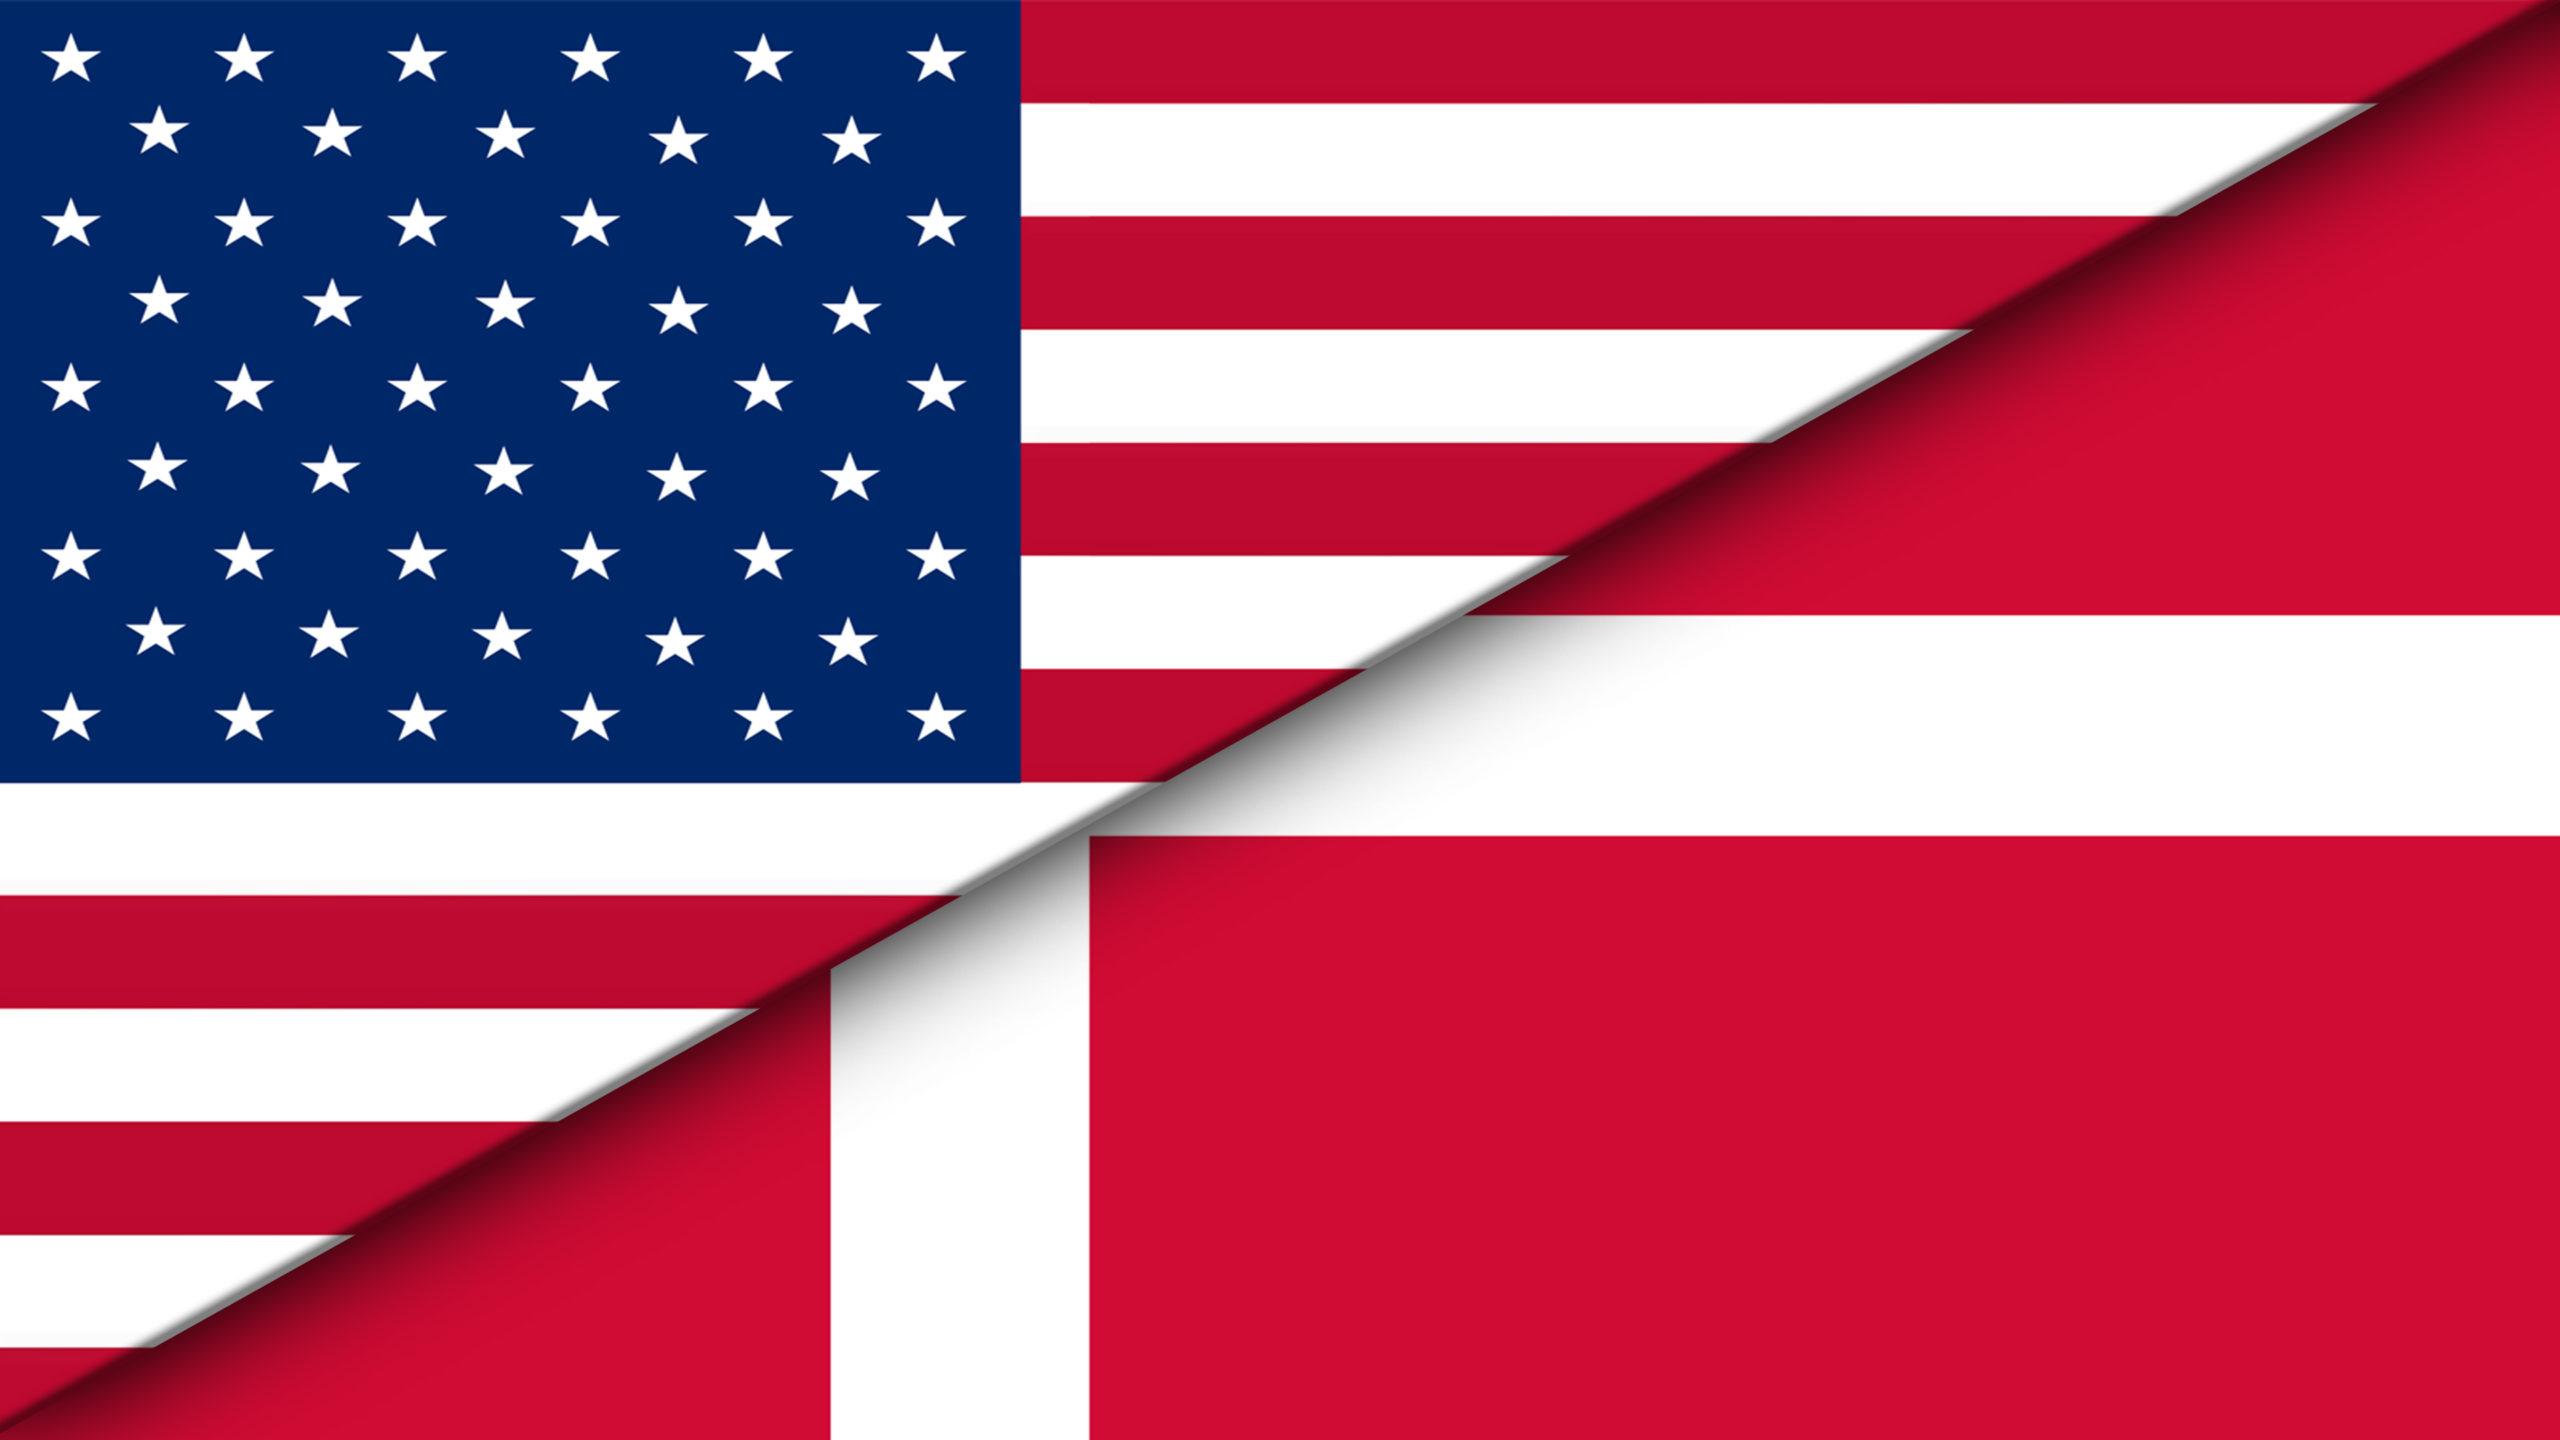 Amercan-Danish flags